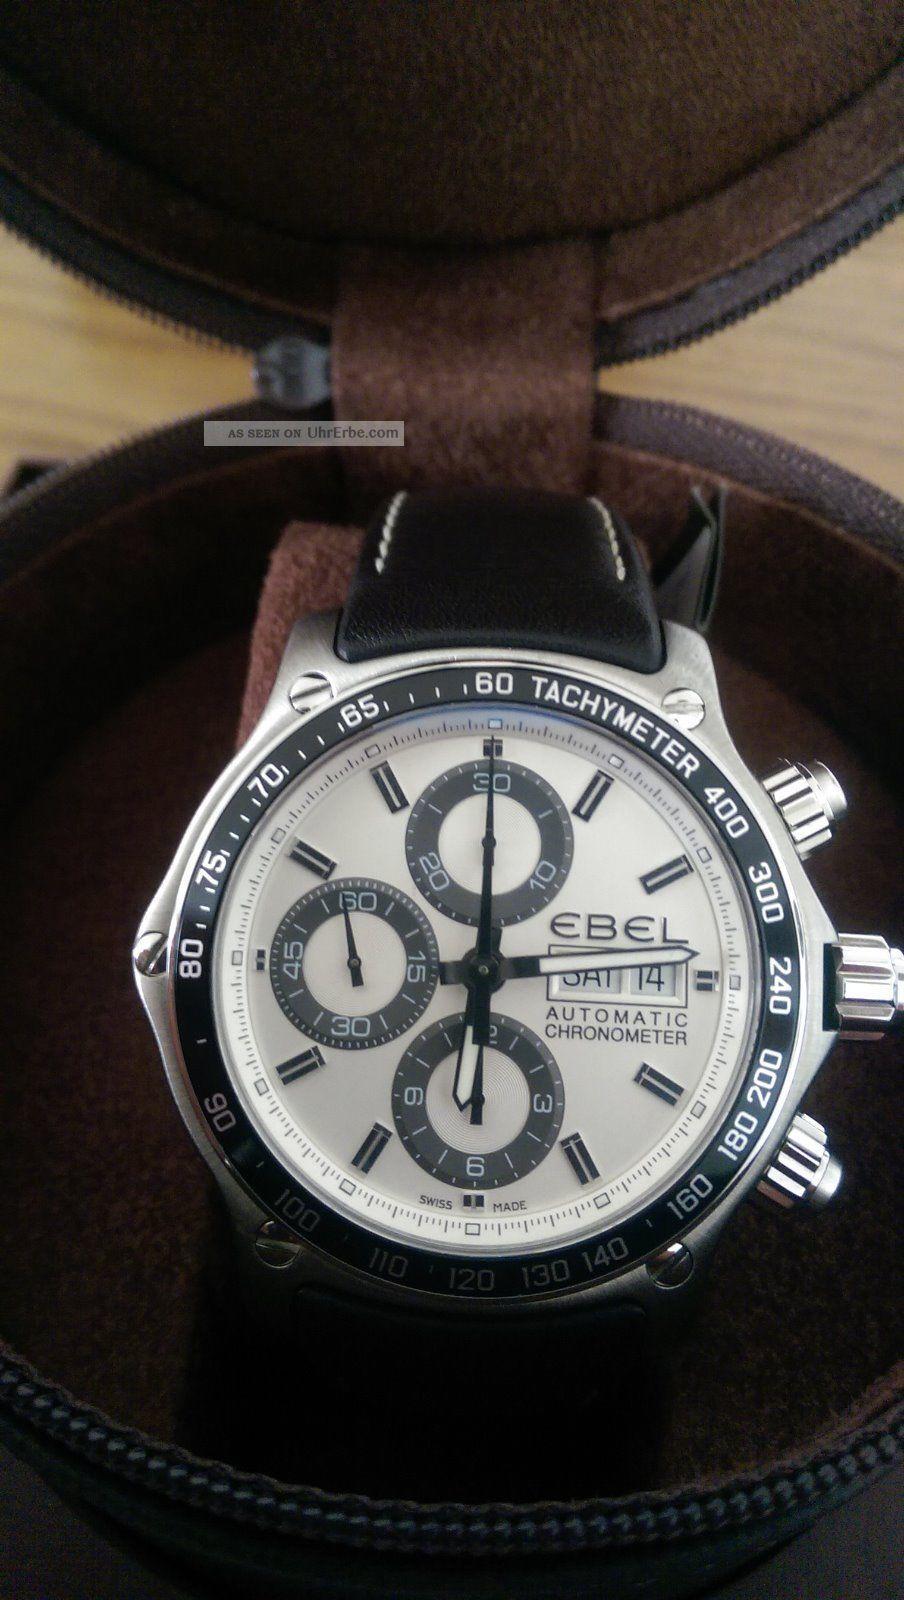 Ebel Chronograph Uhr 1911 Discovery Chronometer Armbanduhren Bild